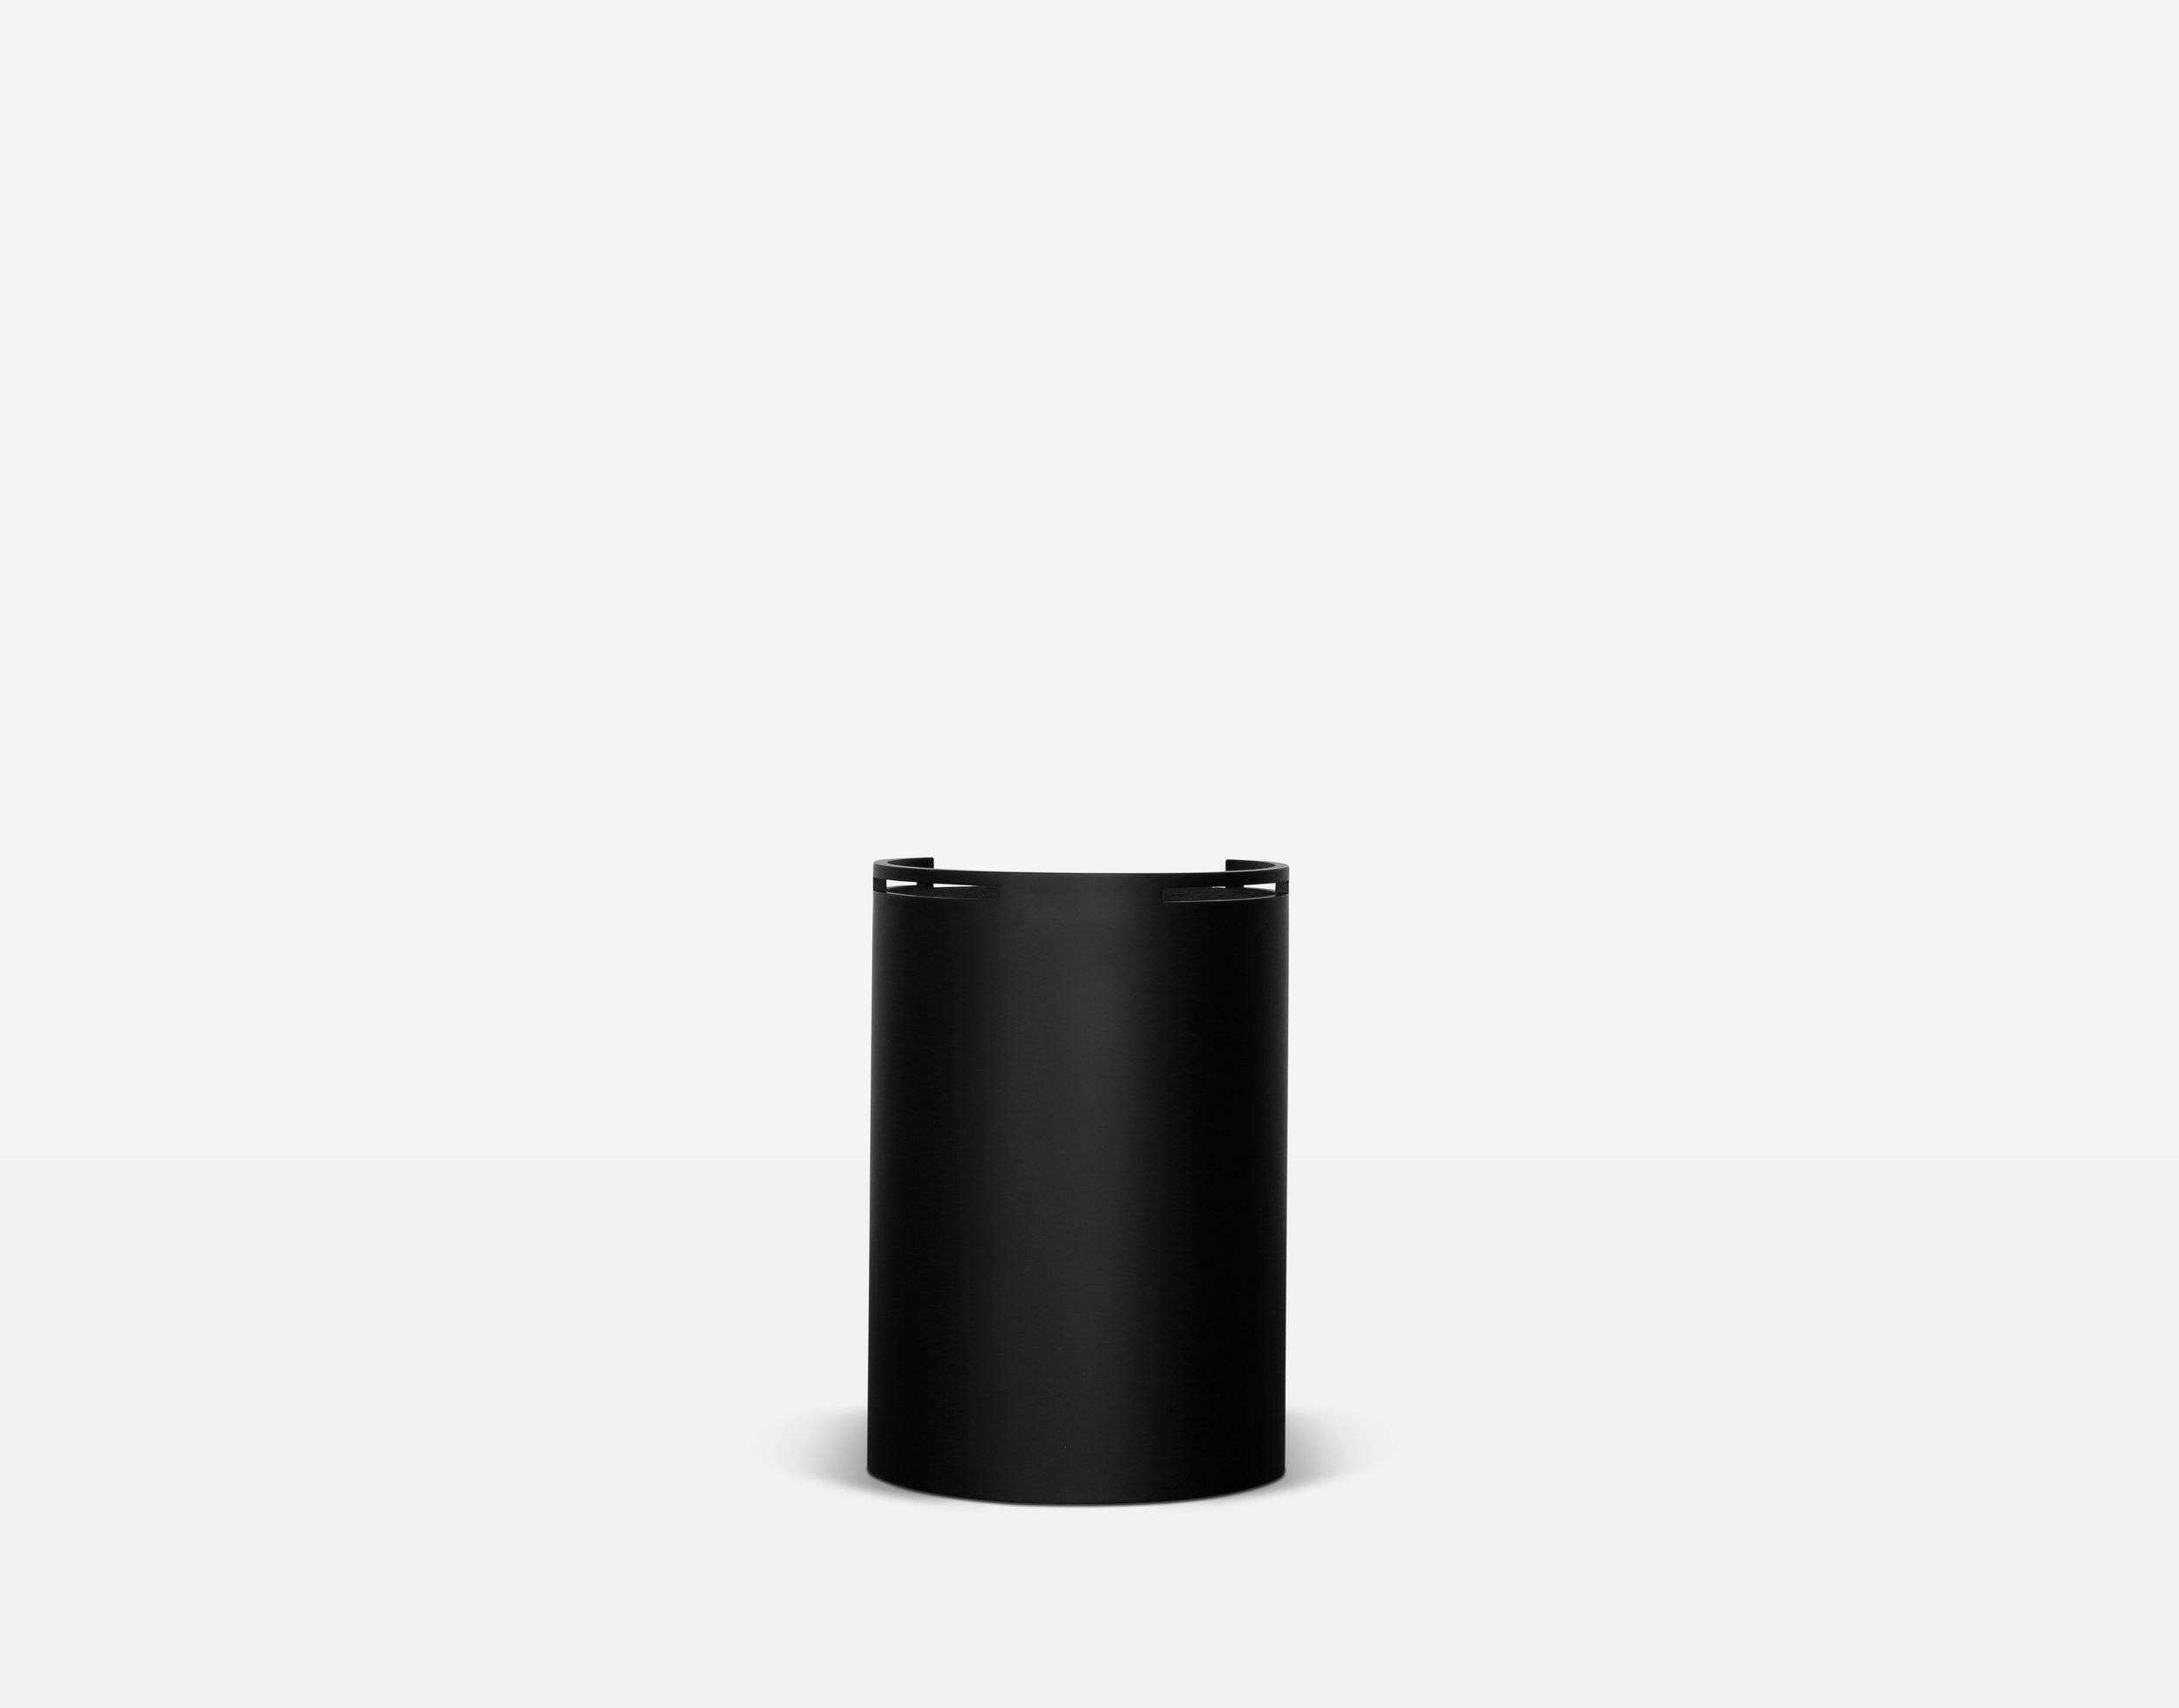 Luteca_JI_Valle-Side-Table_Black-Steel-Volcanic-Stone_B-W.jpg